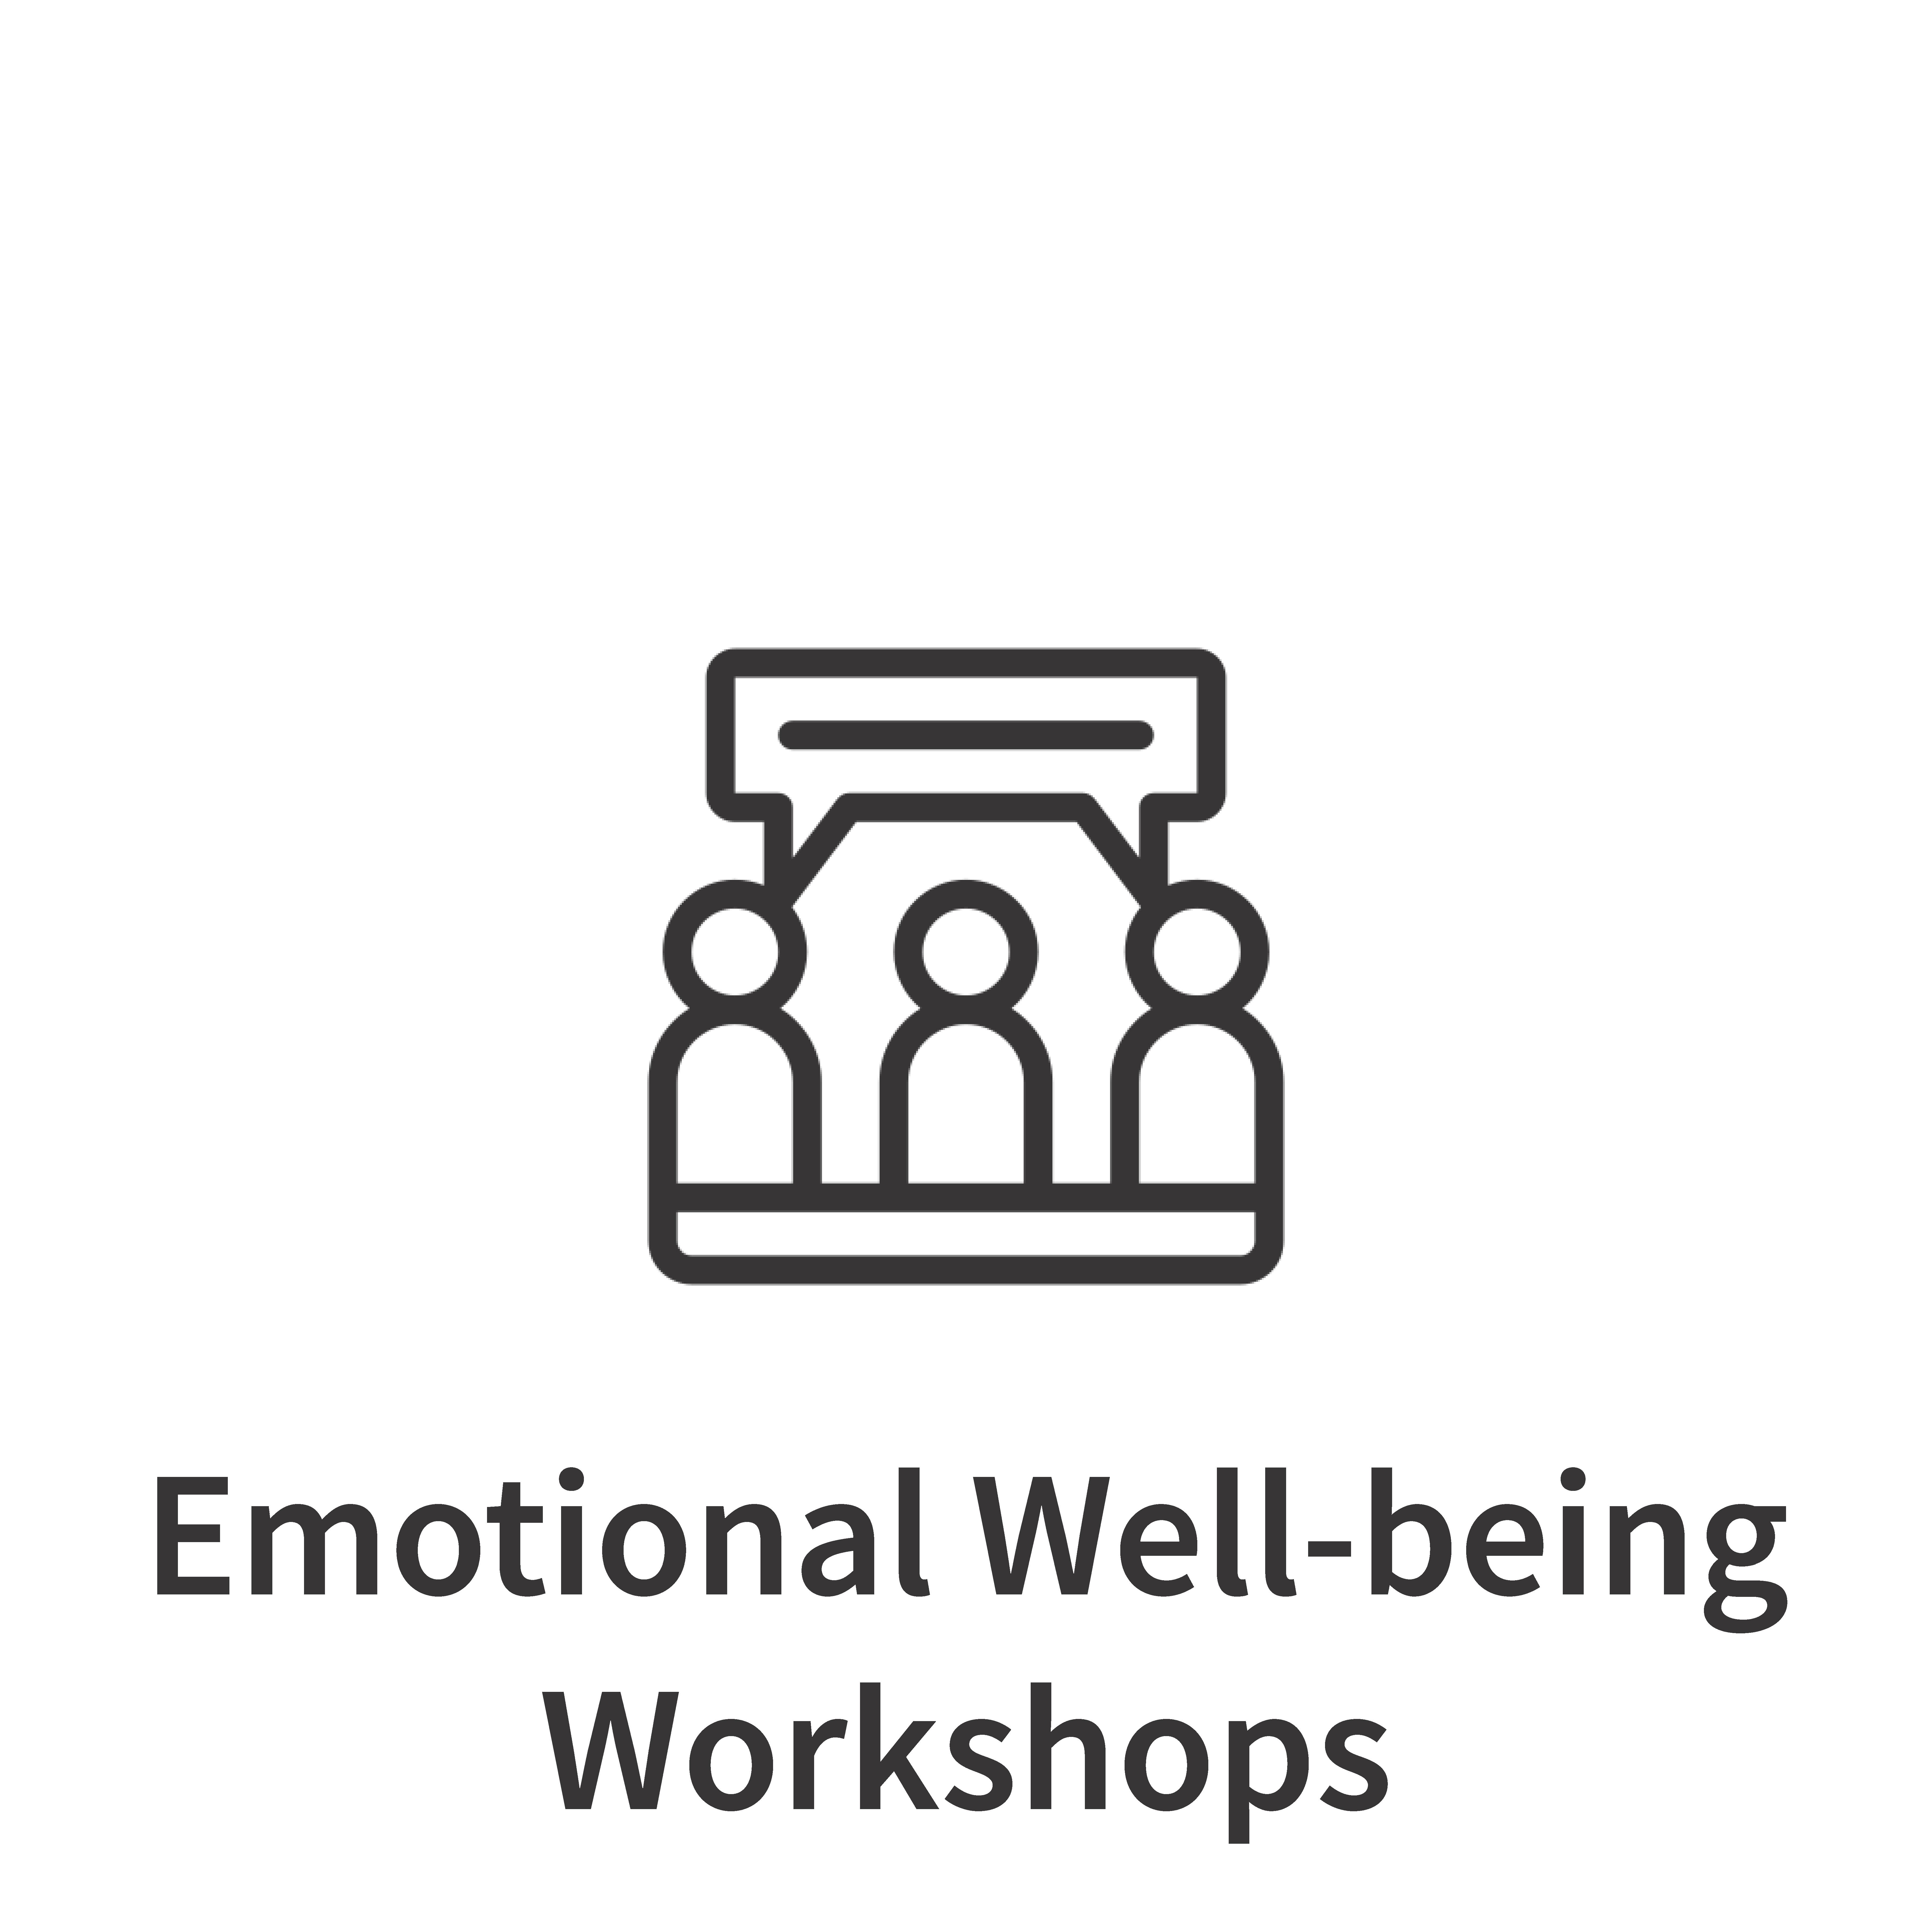 Emotional Well-being Workshops